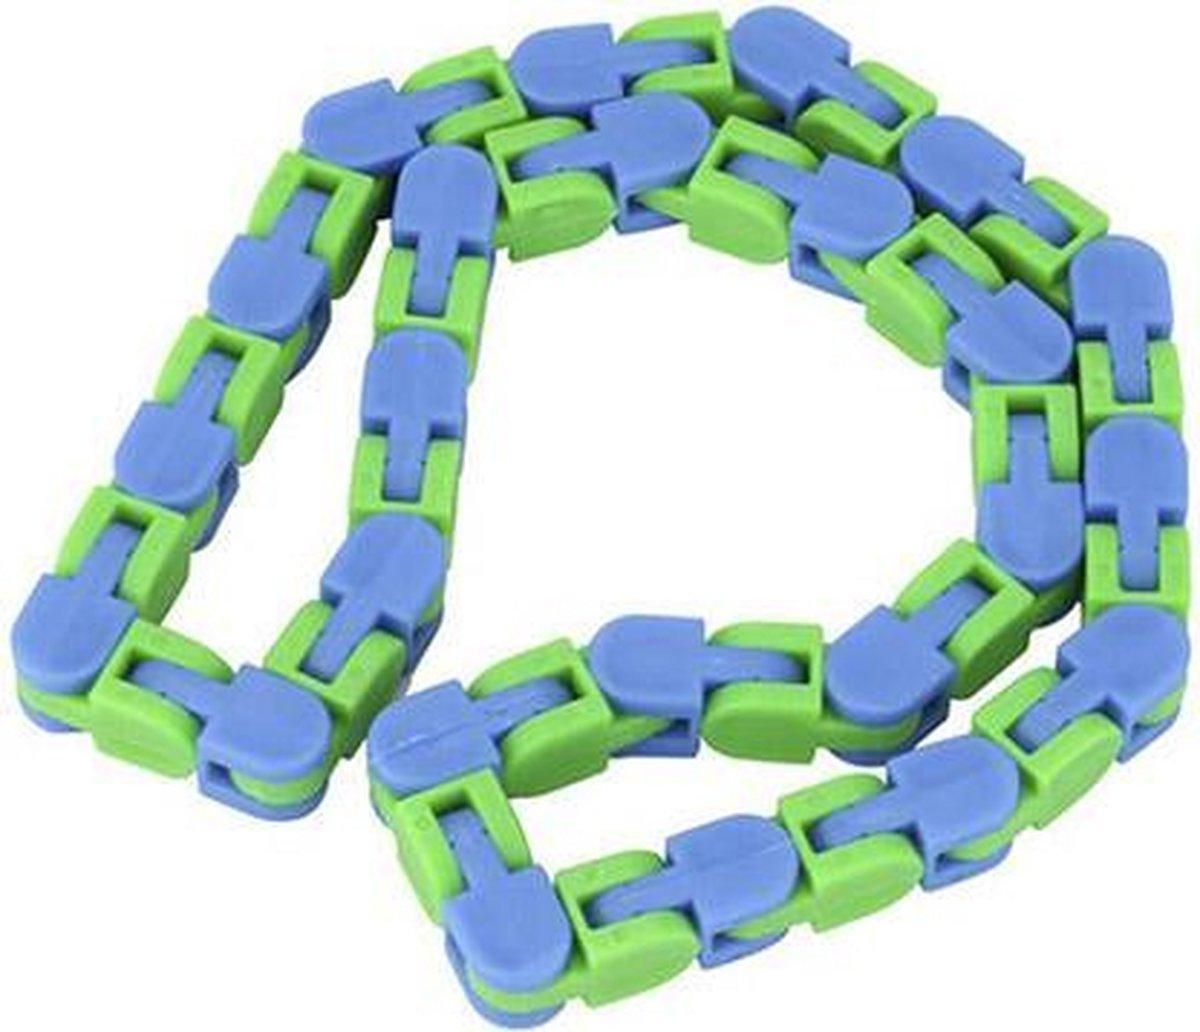 Wacky tracks | fidget toys | ketting | groen - blauw